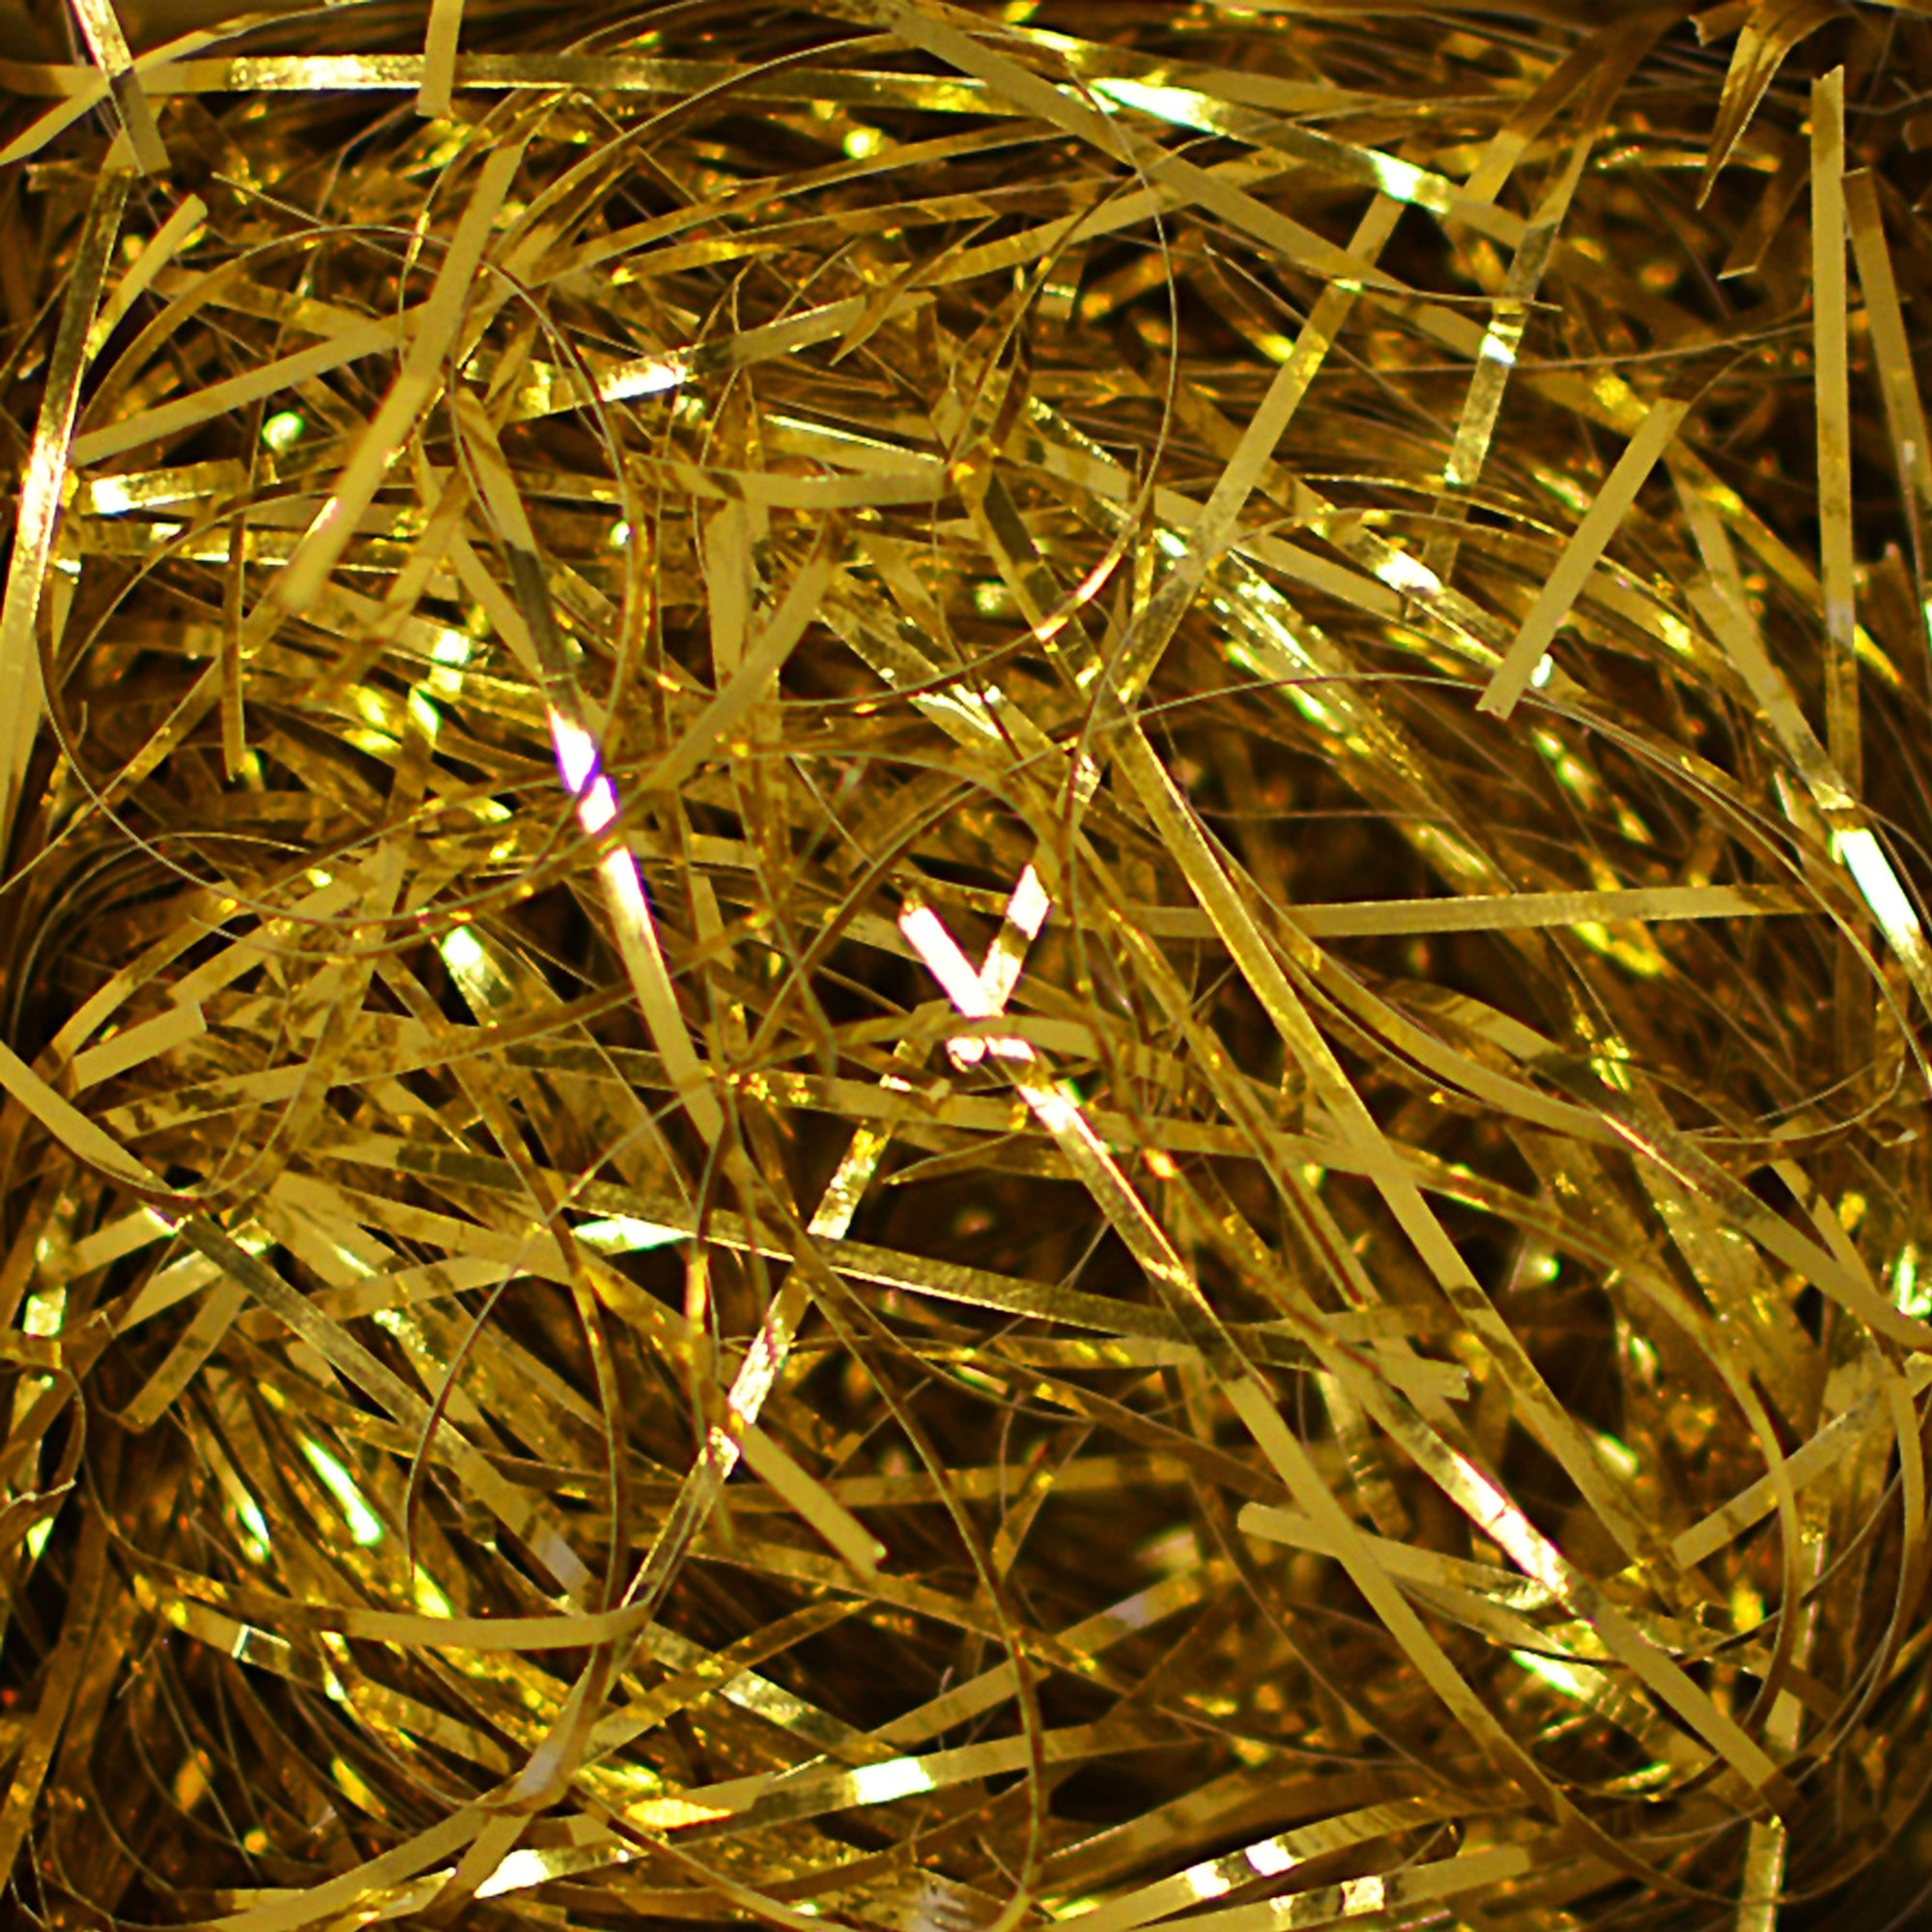 BOX USA BCPPM10B PureMetallic Shred Veryfine Cut, 10 lb, Gold (1 Case of 10 Lbs.) by BOX USA